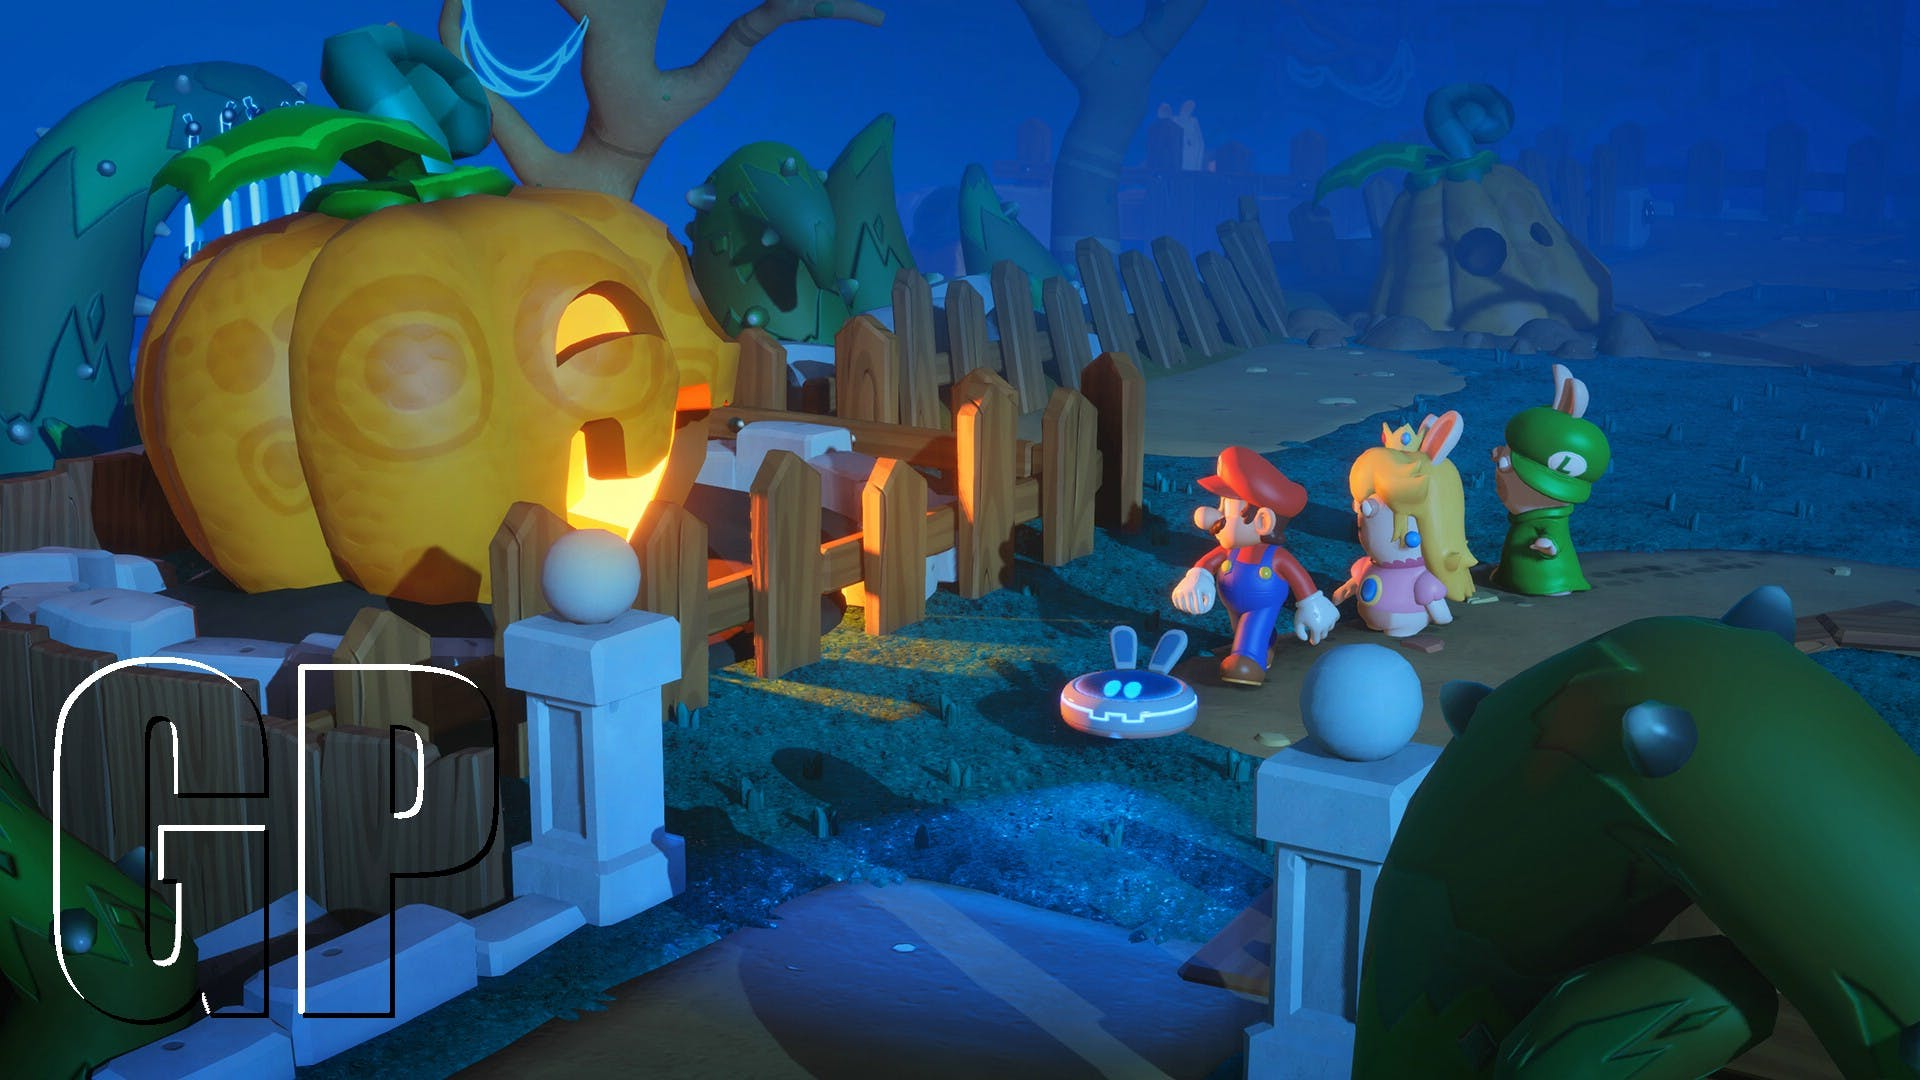 Mario + Rabbids go exploring